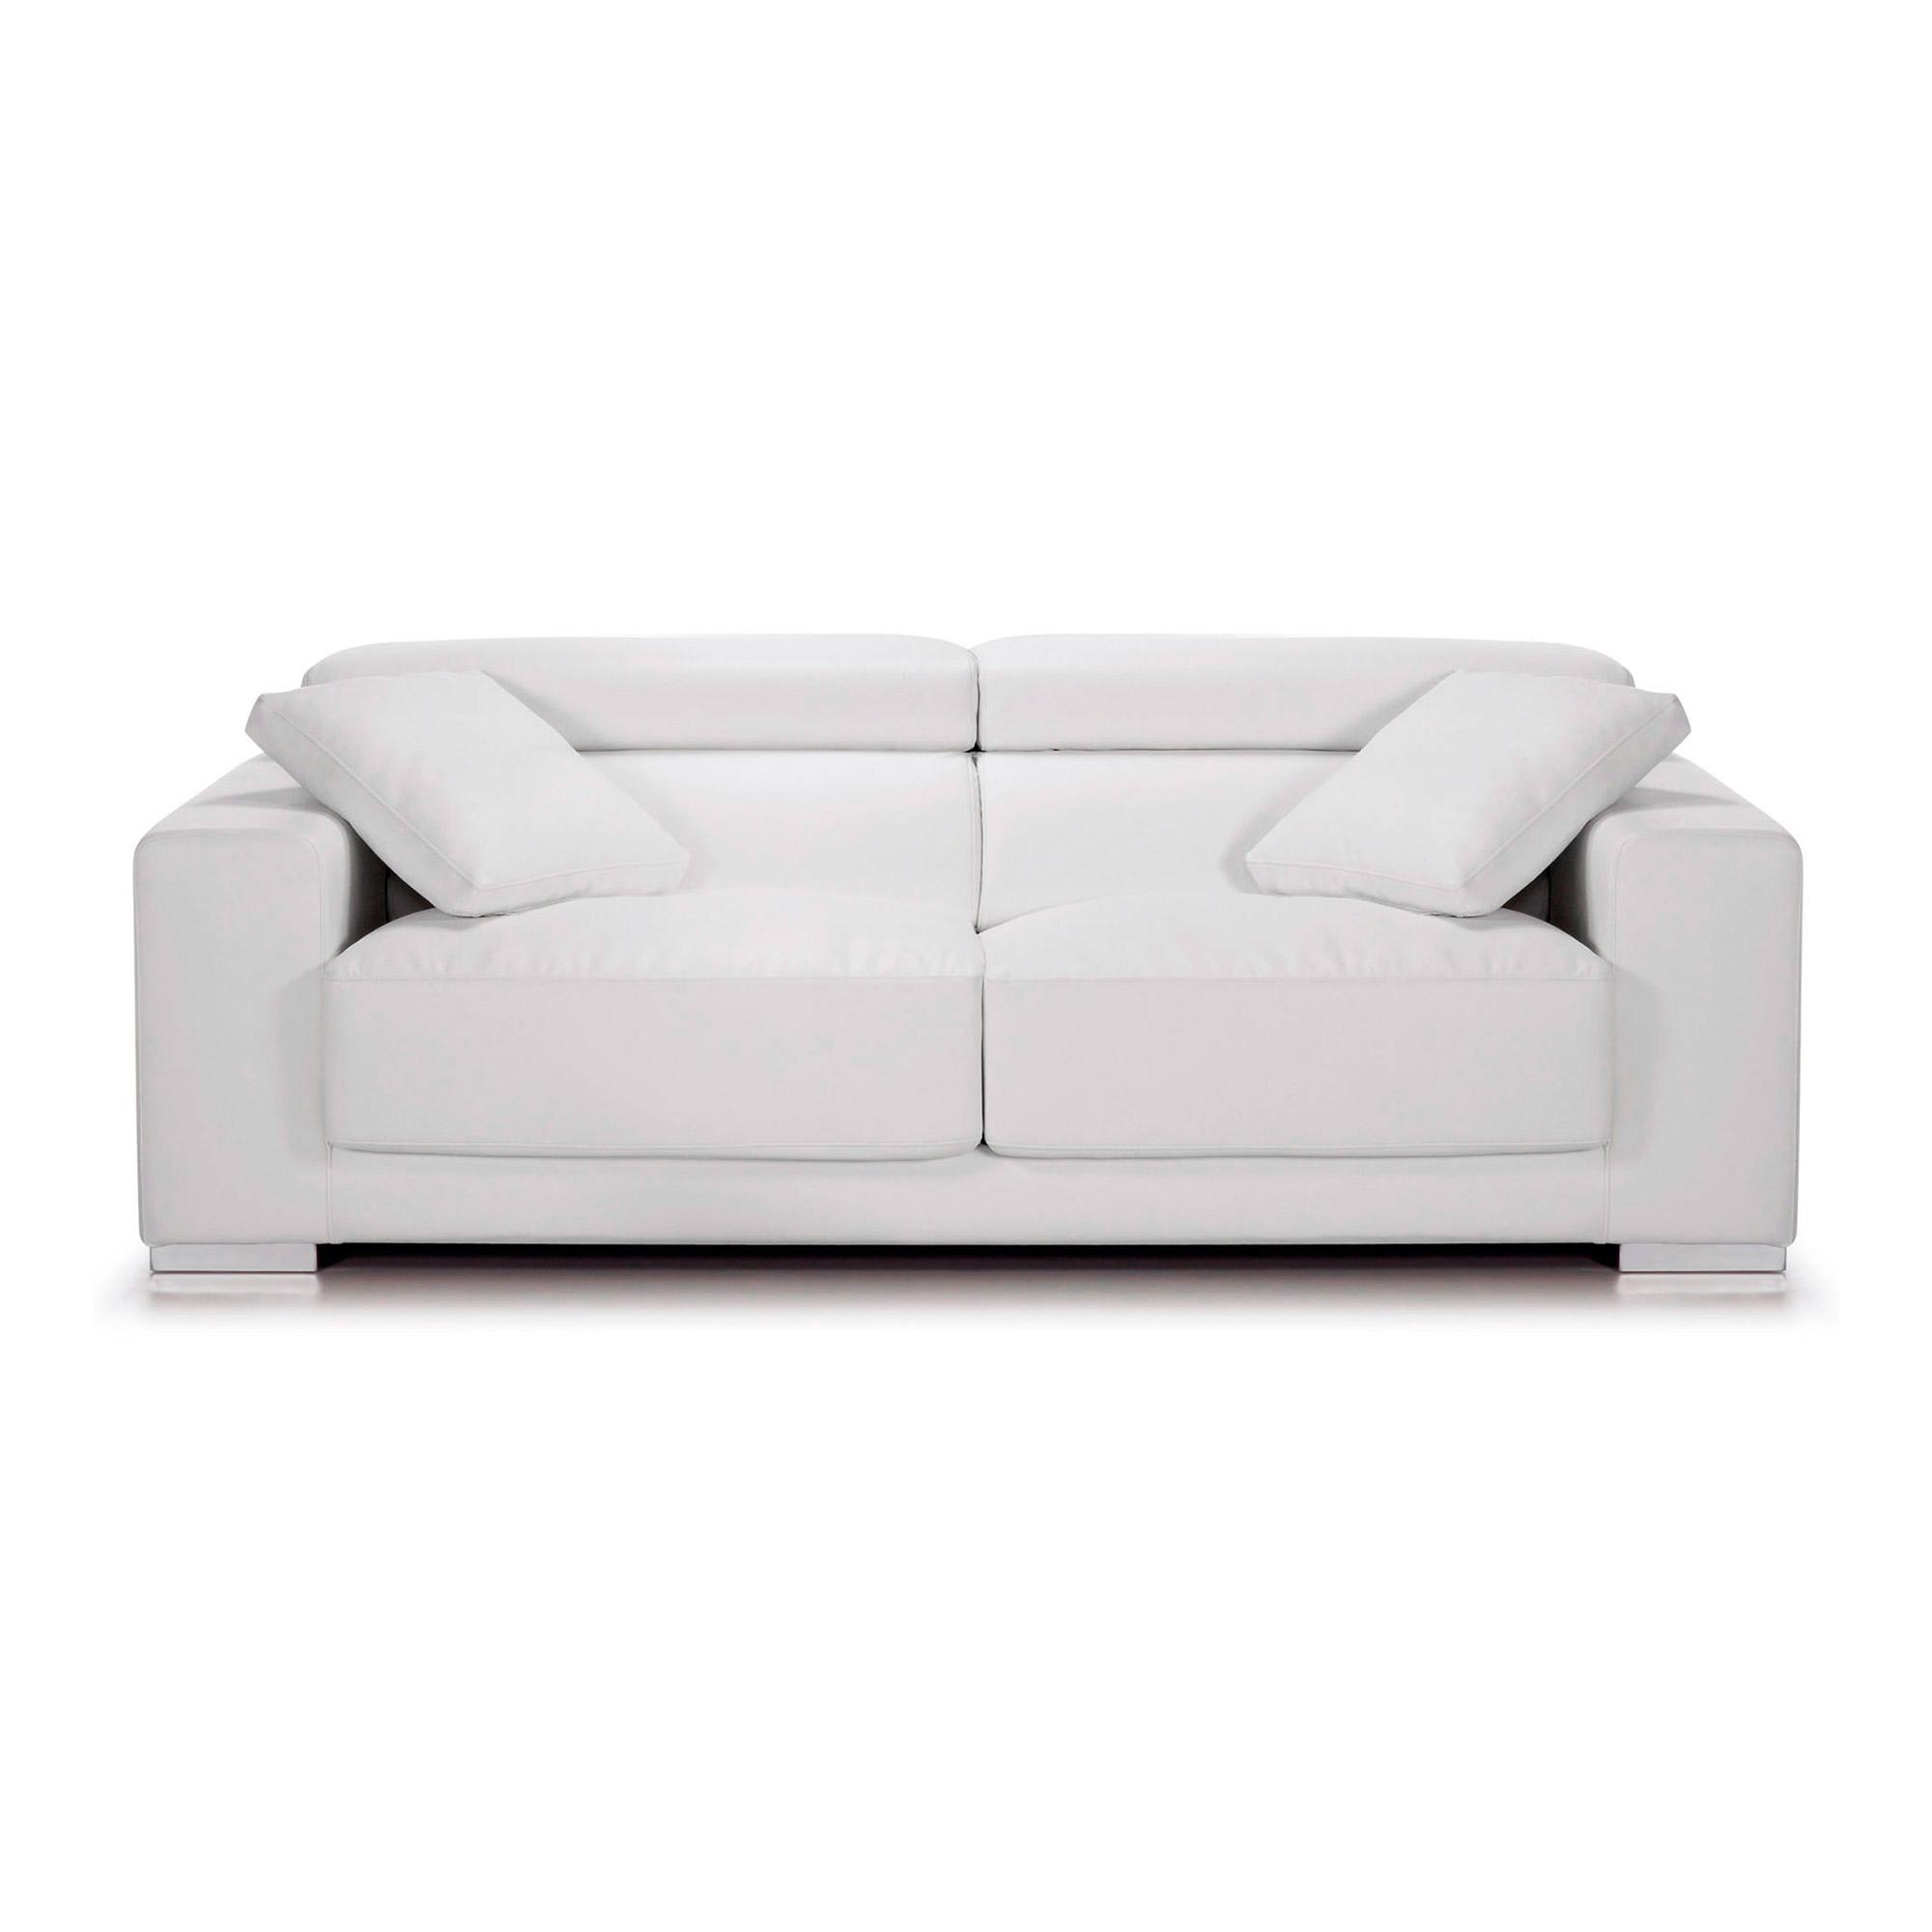 singapore sofa 3p recl desliz eco piel blanco puro ep05 no. Black Bedroom Furniture Sets. Home Design Ideas